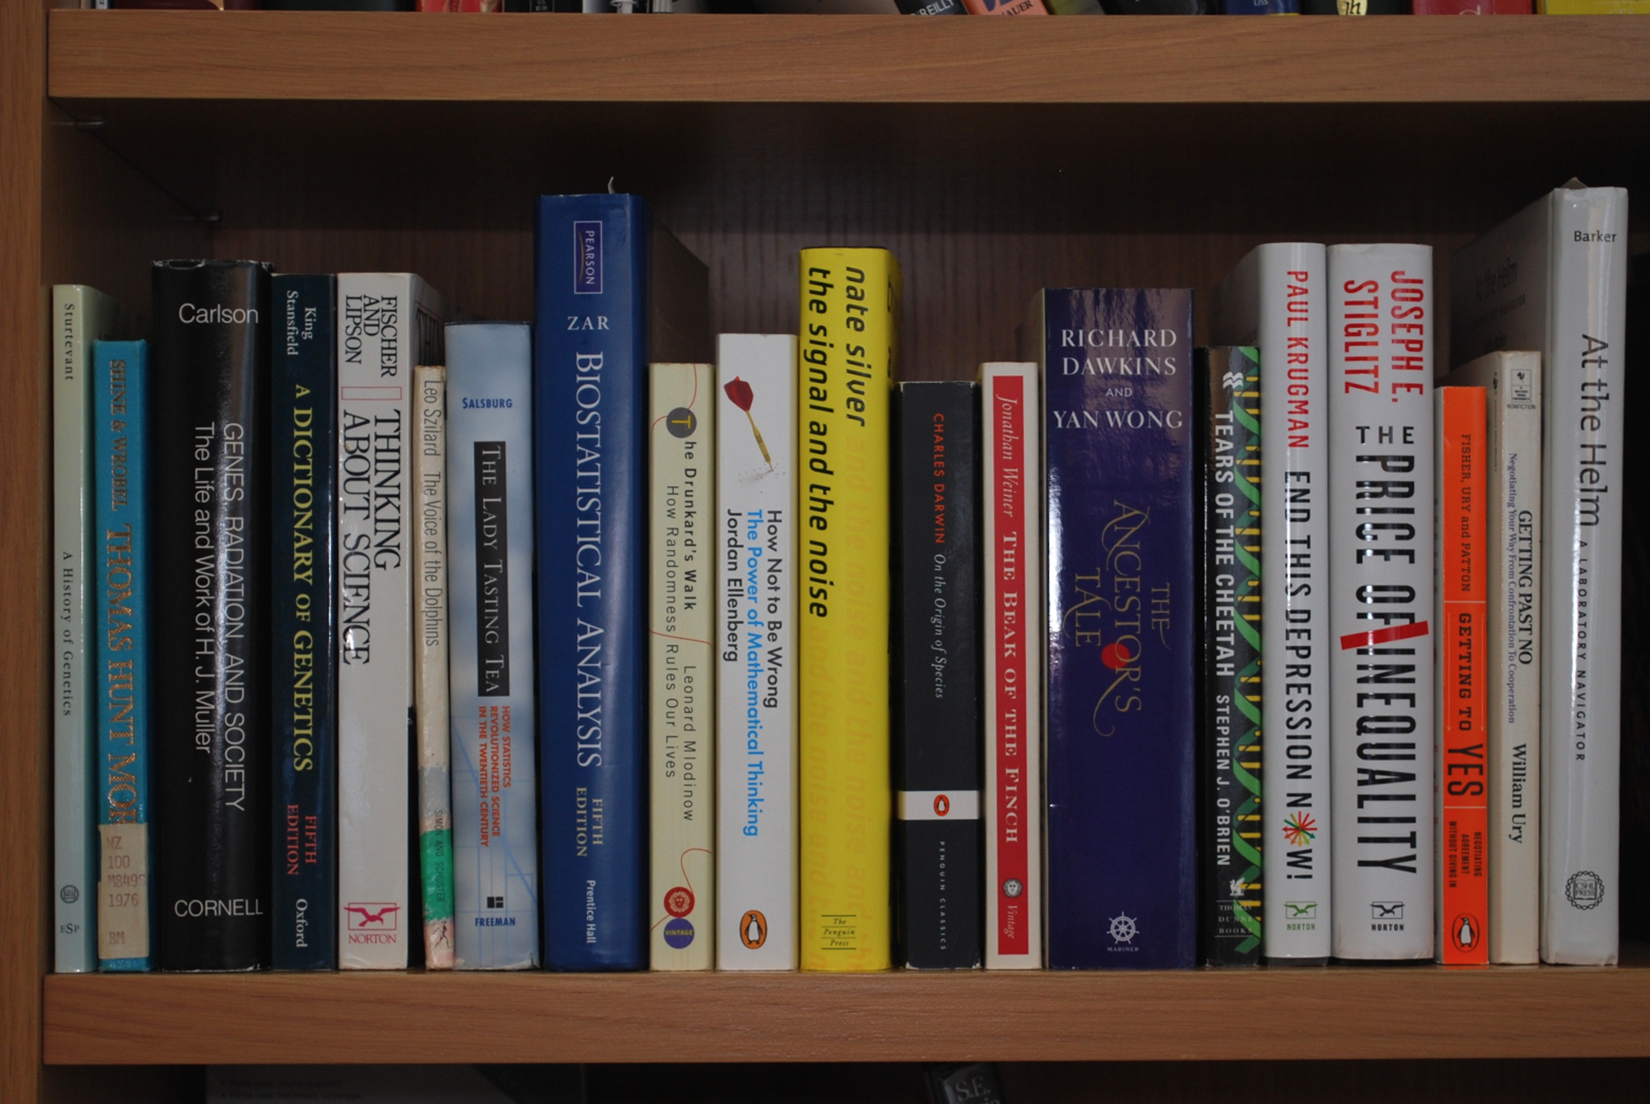 Some books the author has enjoyed.